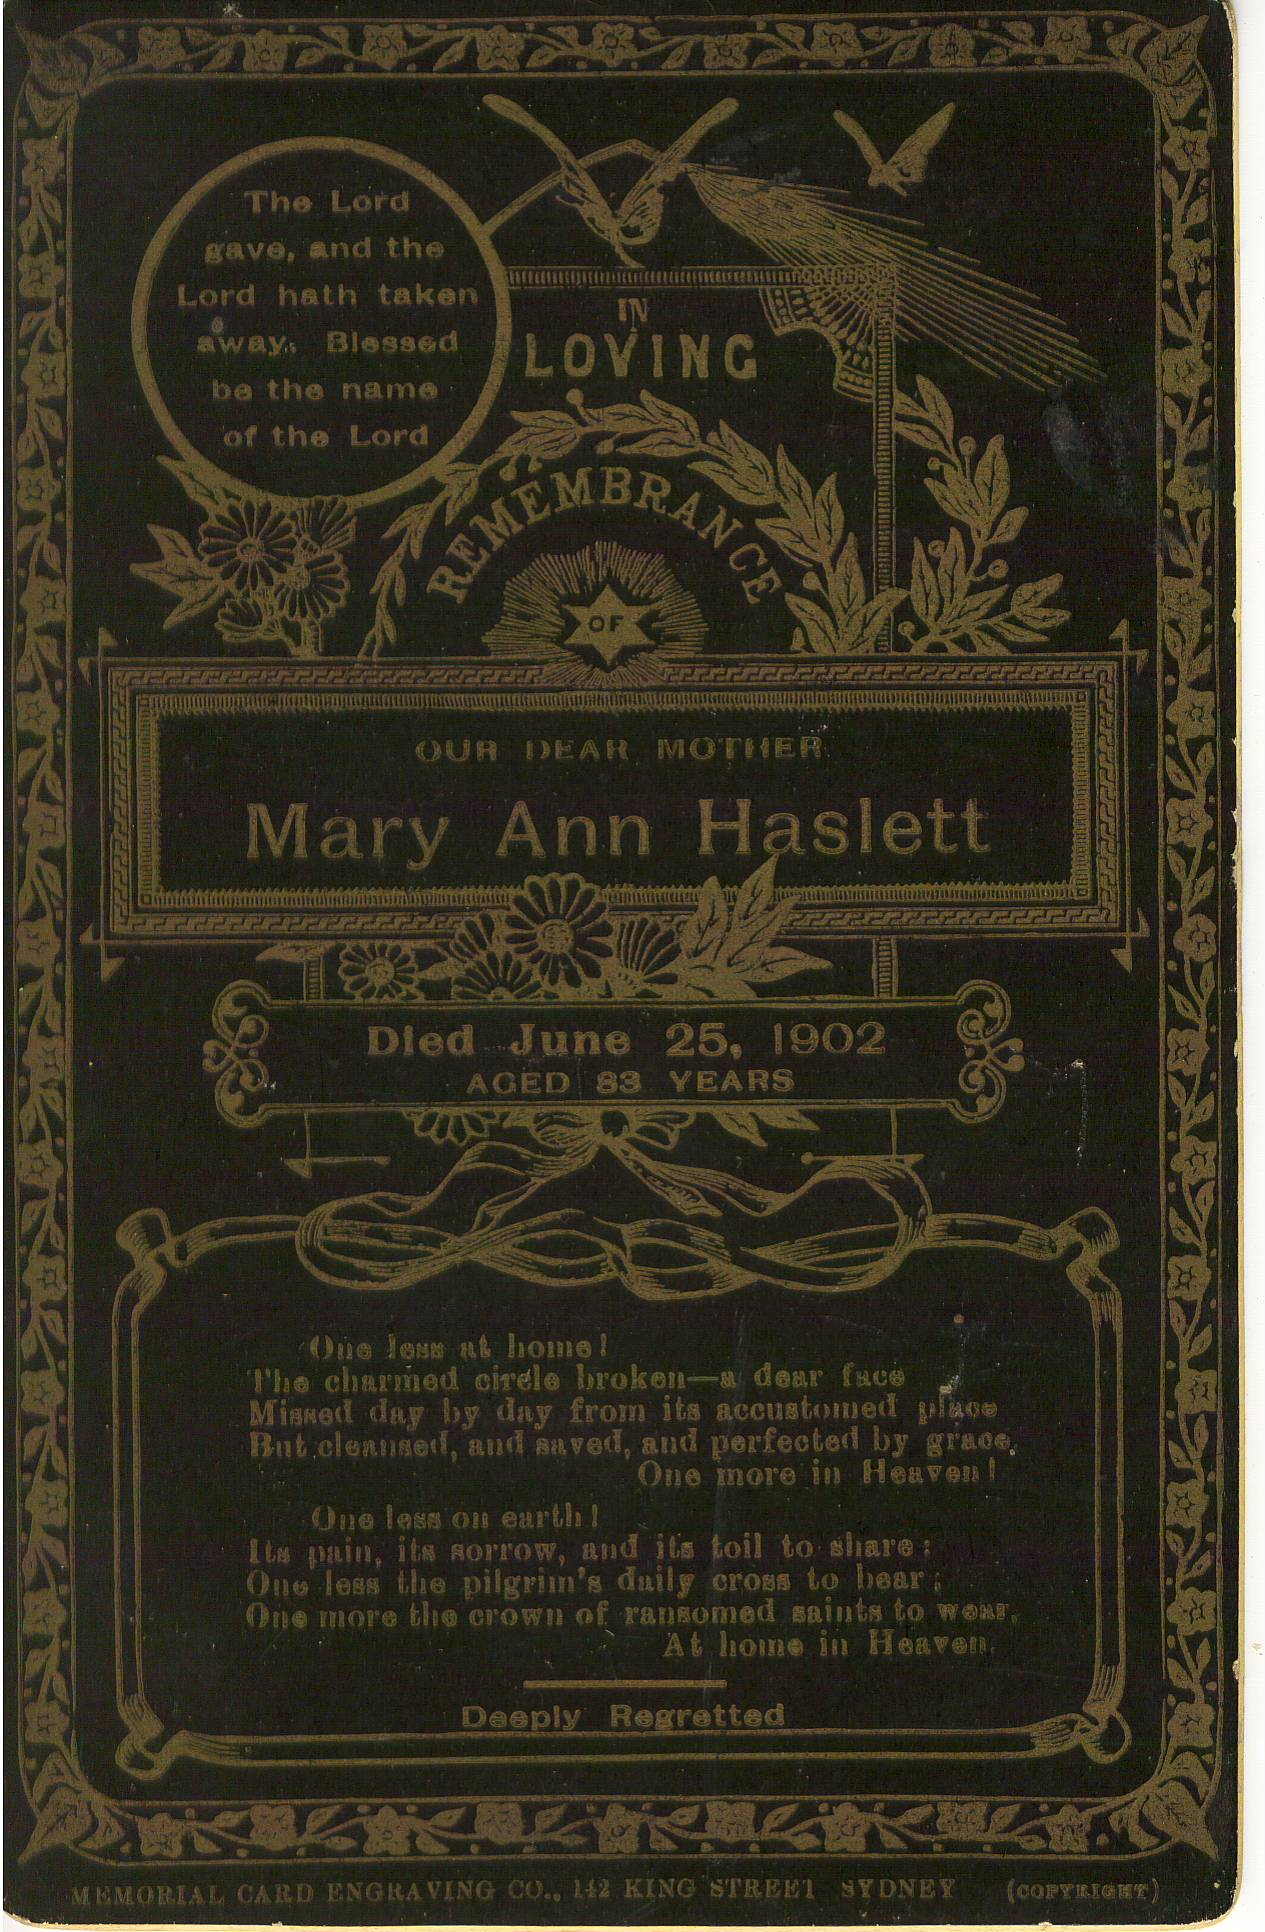 Mary Ann Hislet